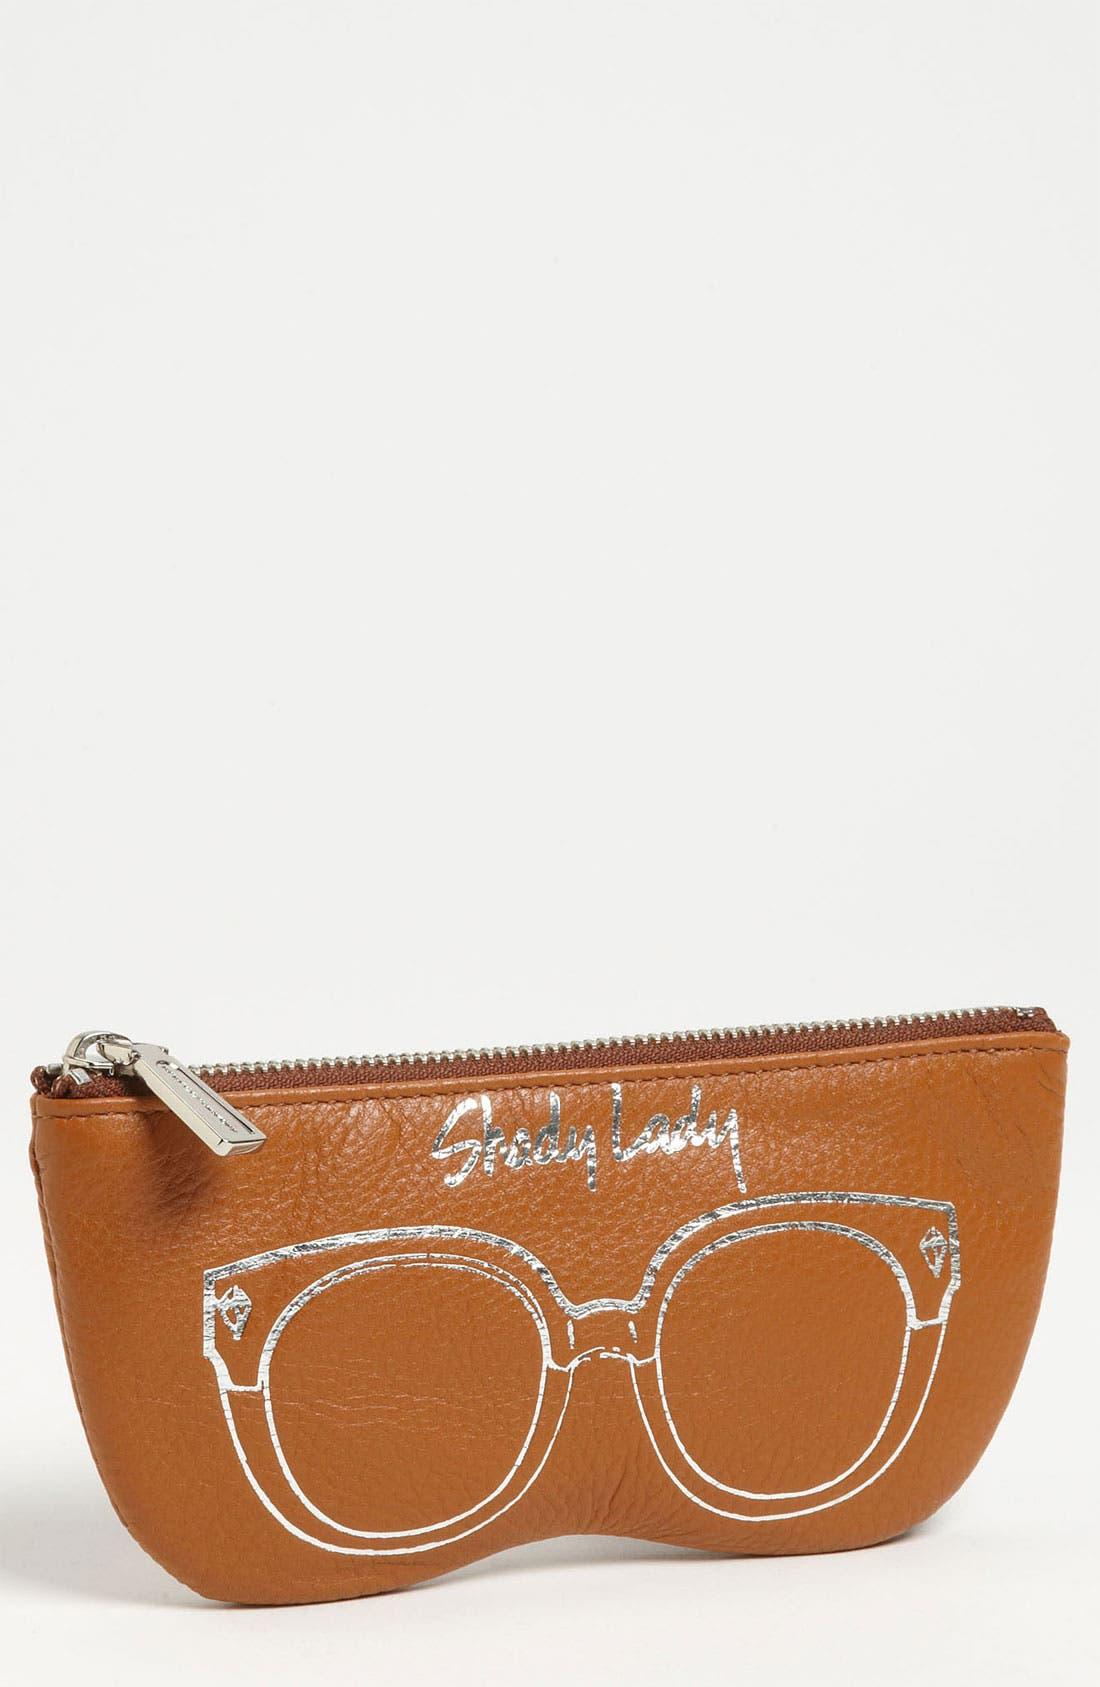 Alternate Image 1 Selected - Rebecca Minkoff 'Shady Lady' Leather Sunglasses Case